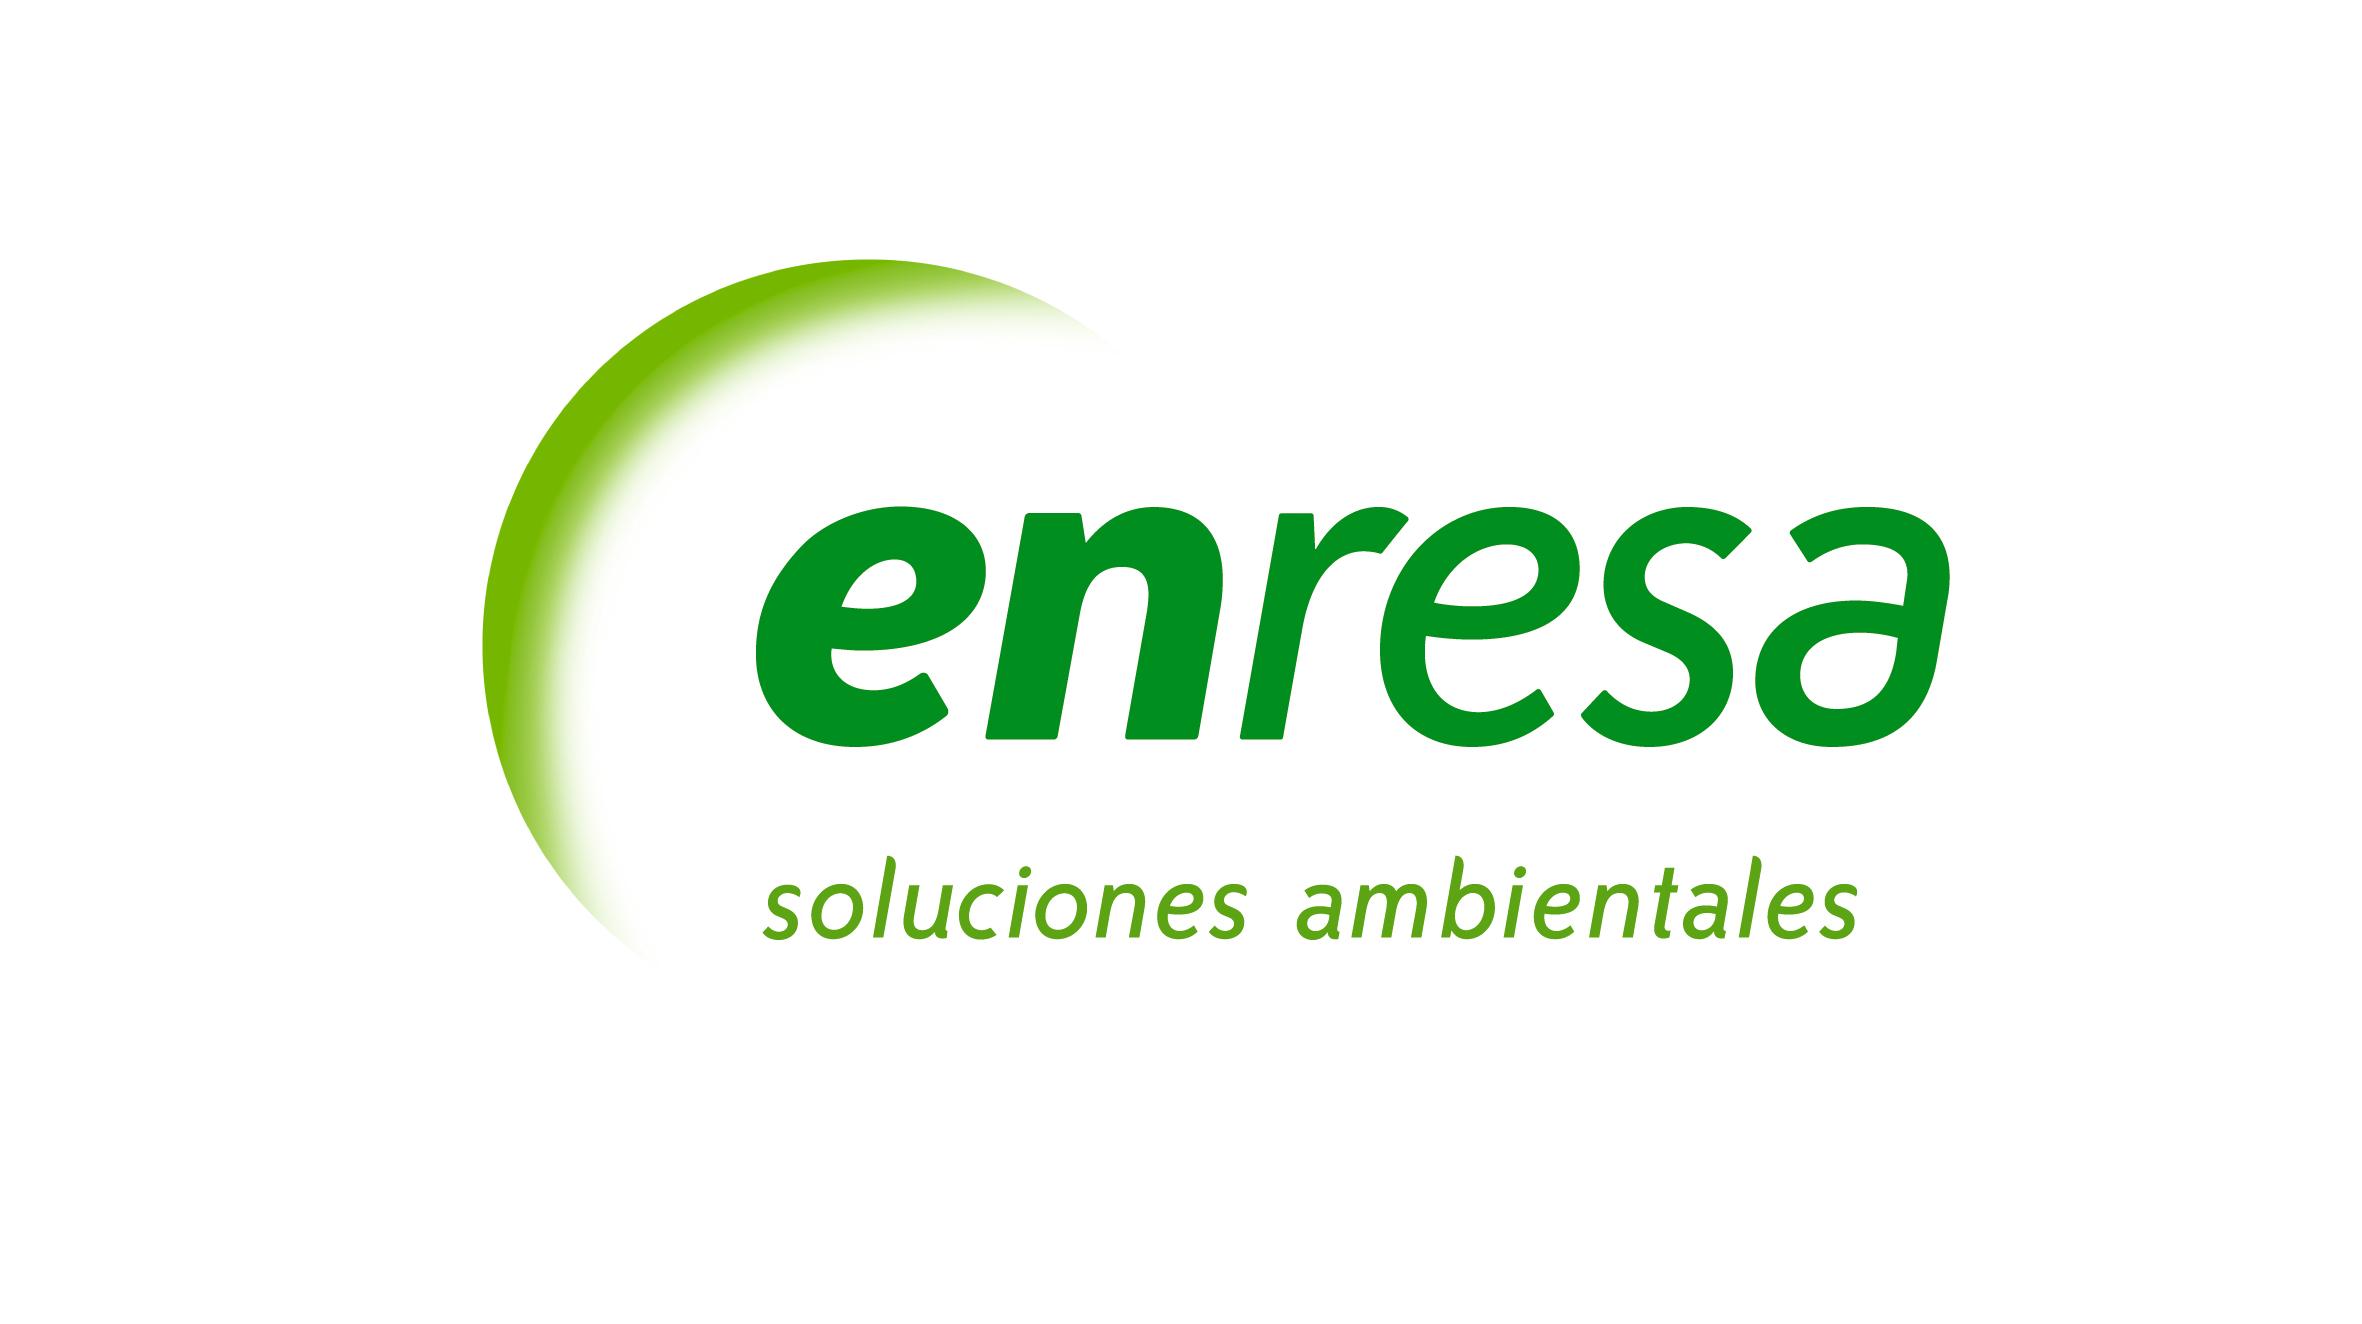 Qu es enresa d nde trabaja desenchufados for Empresas de pladur en valencia